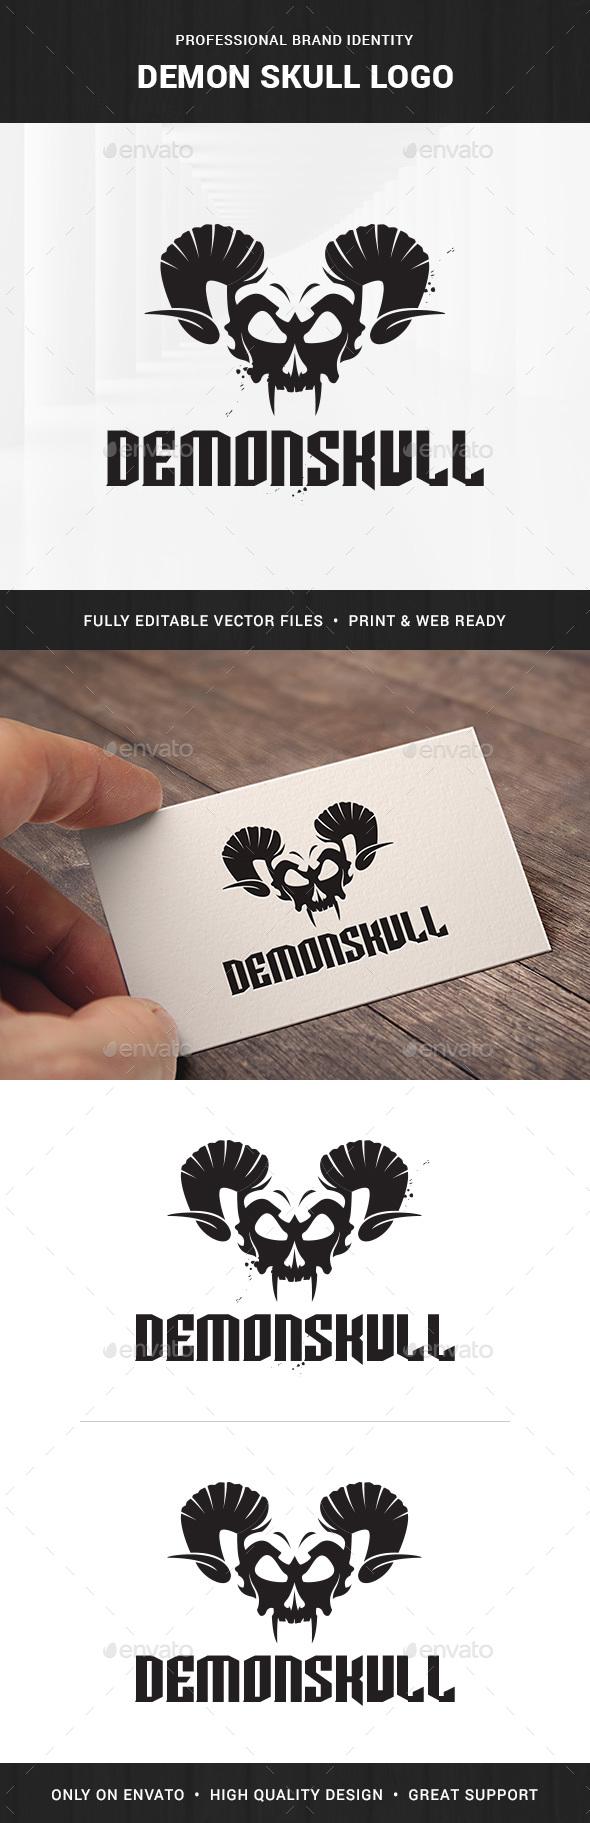 Demon Skull Logo Template - Abstract Logo Templates